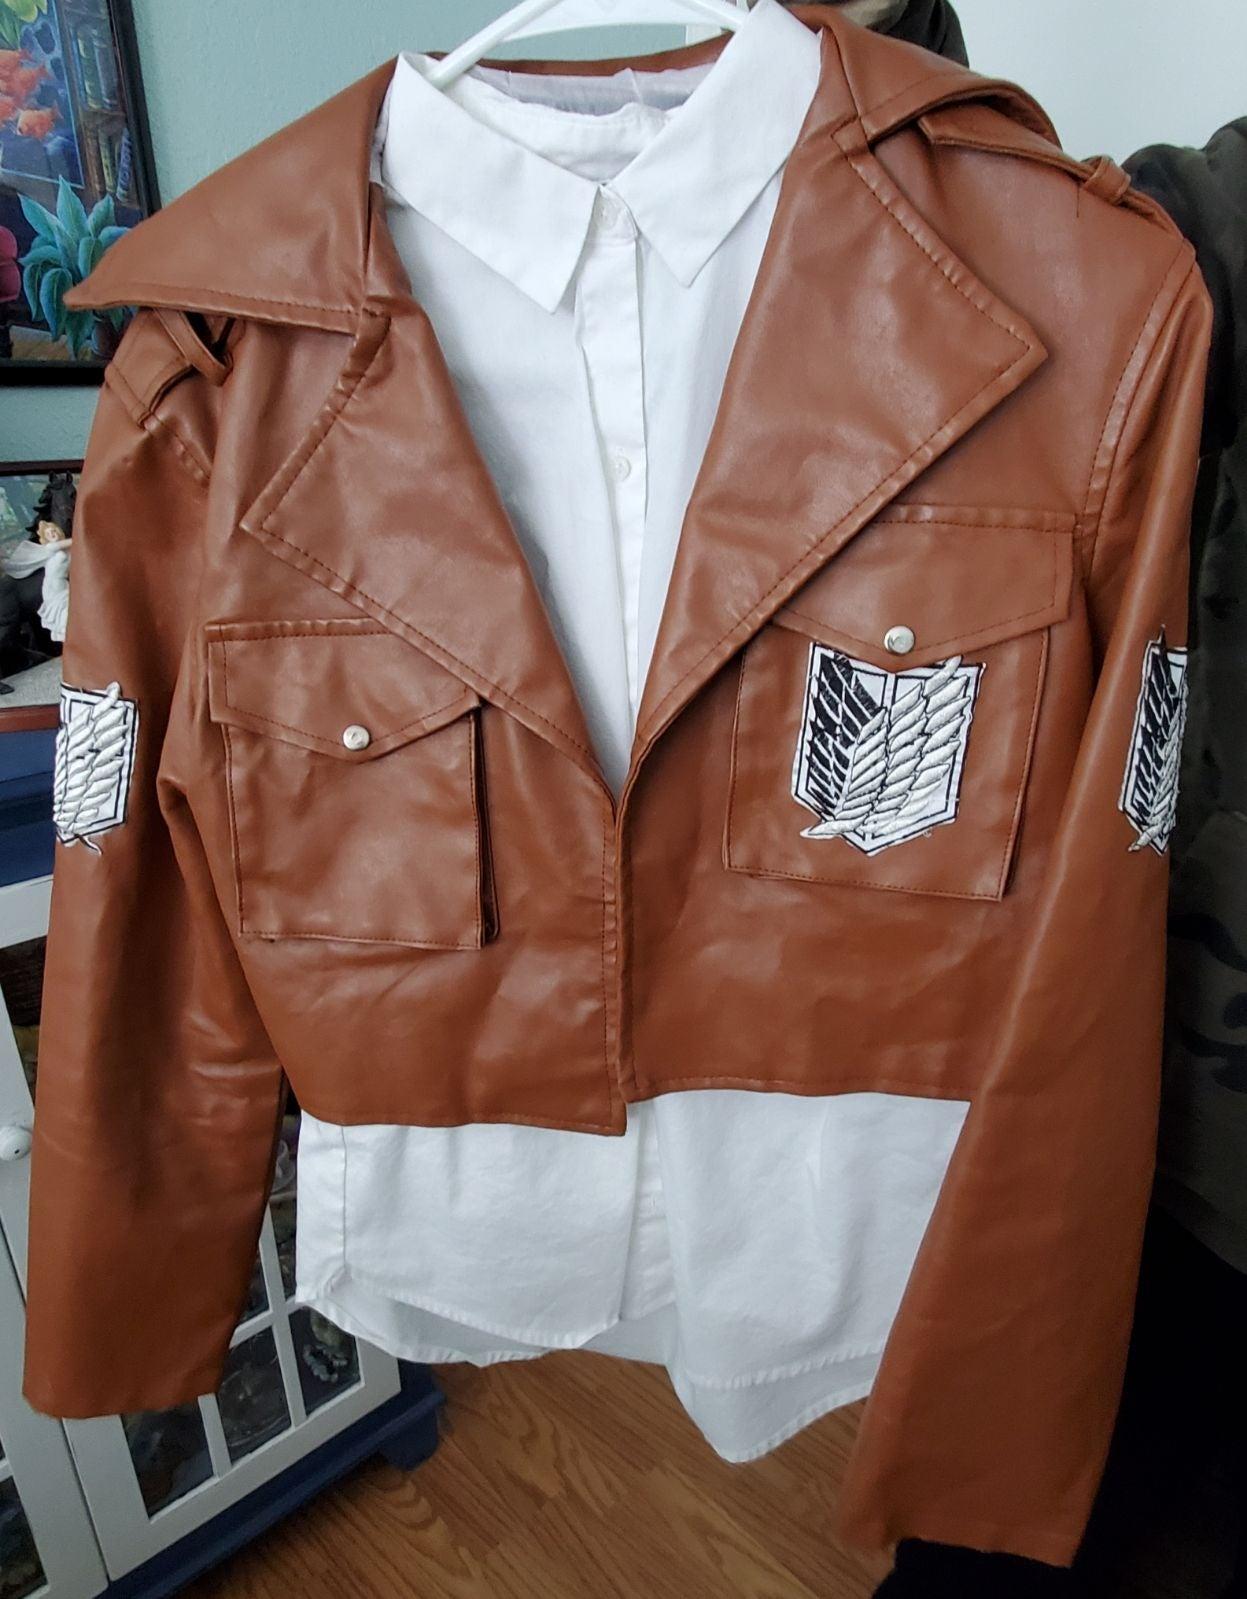 Attack on Titan regiment jacket